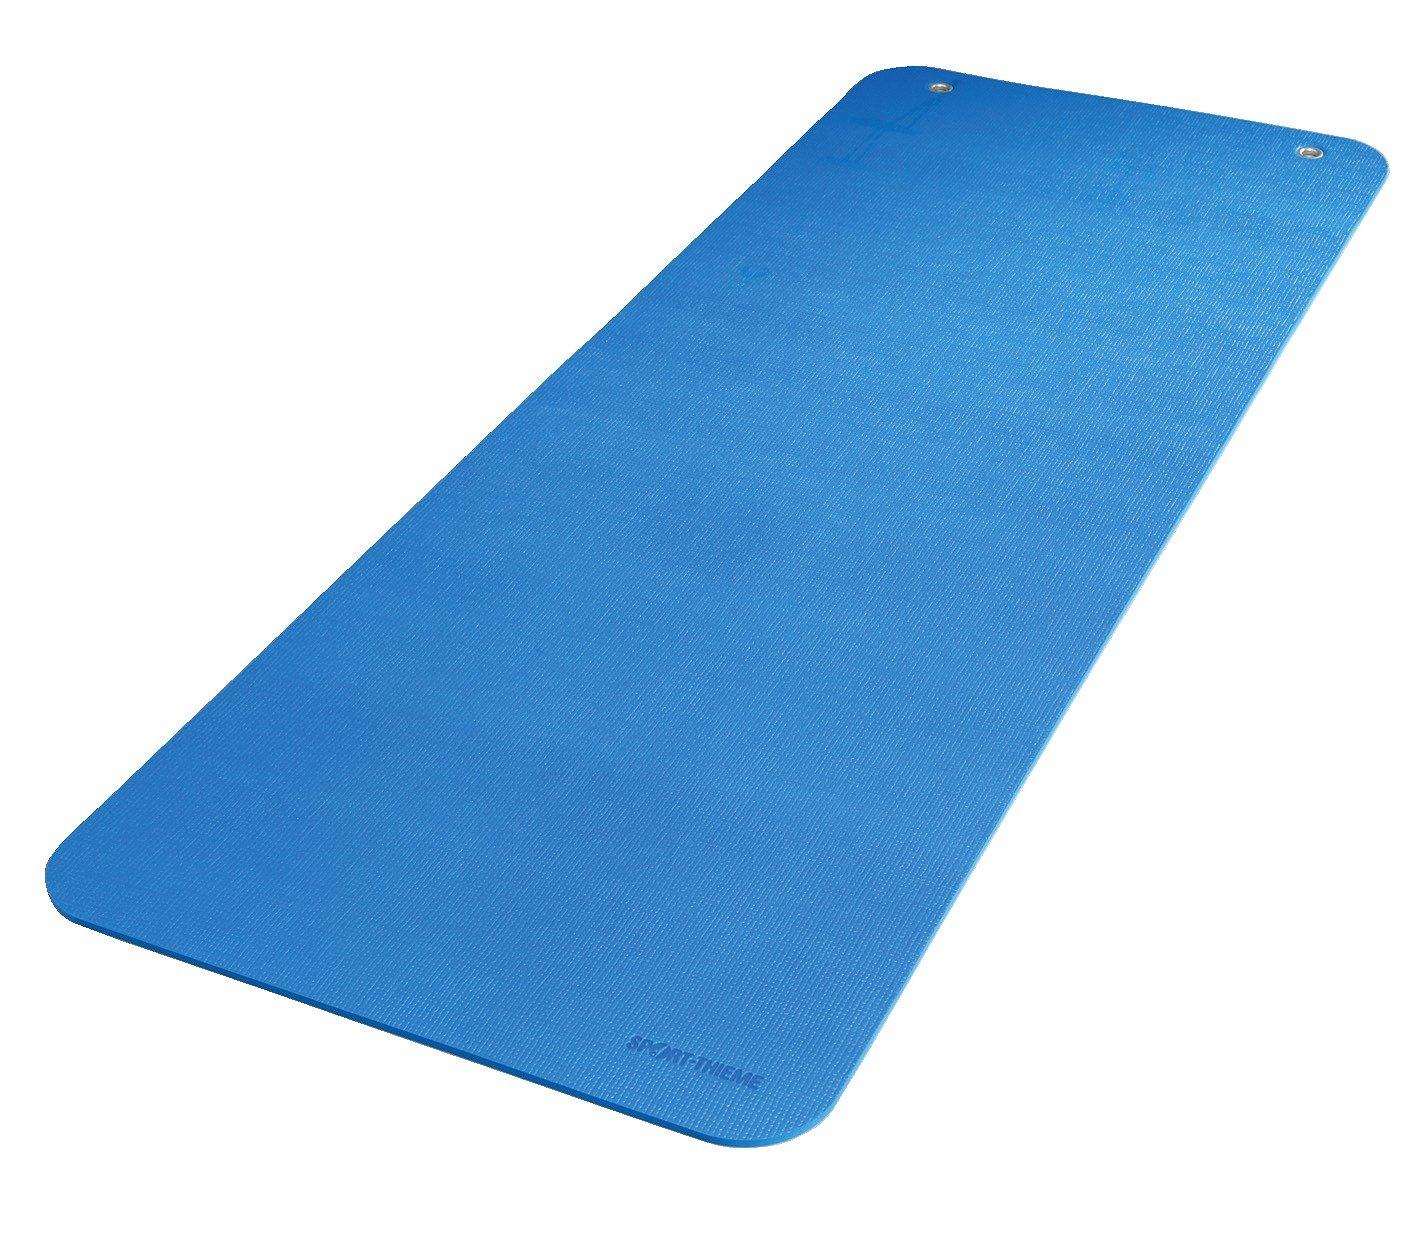 Sport-Thieme® Gymnastikmatte Fit&Fun Blau, Ca. 180x60x1,0 cm